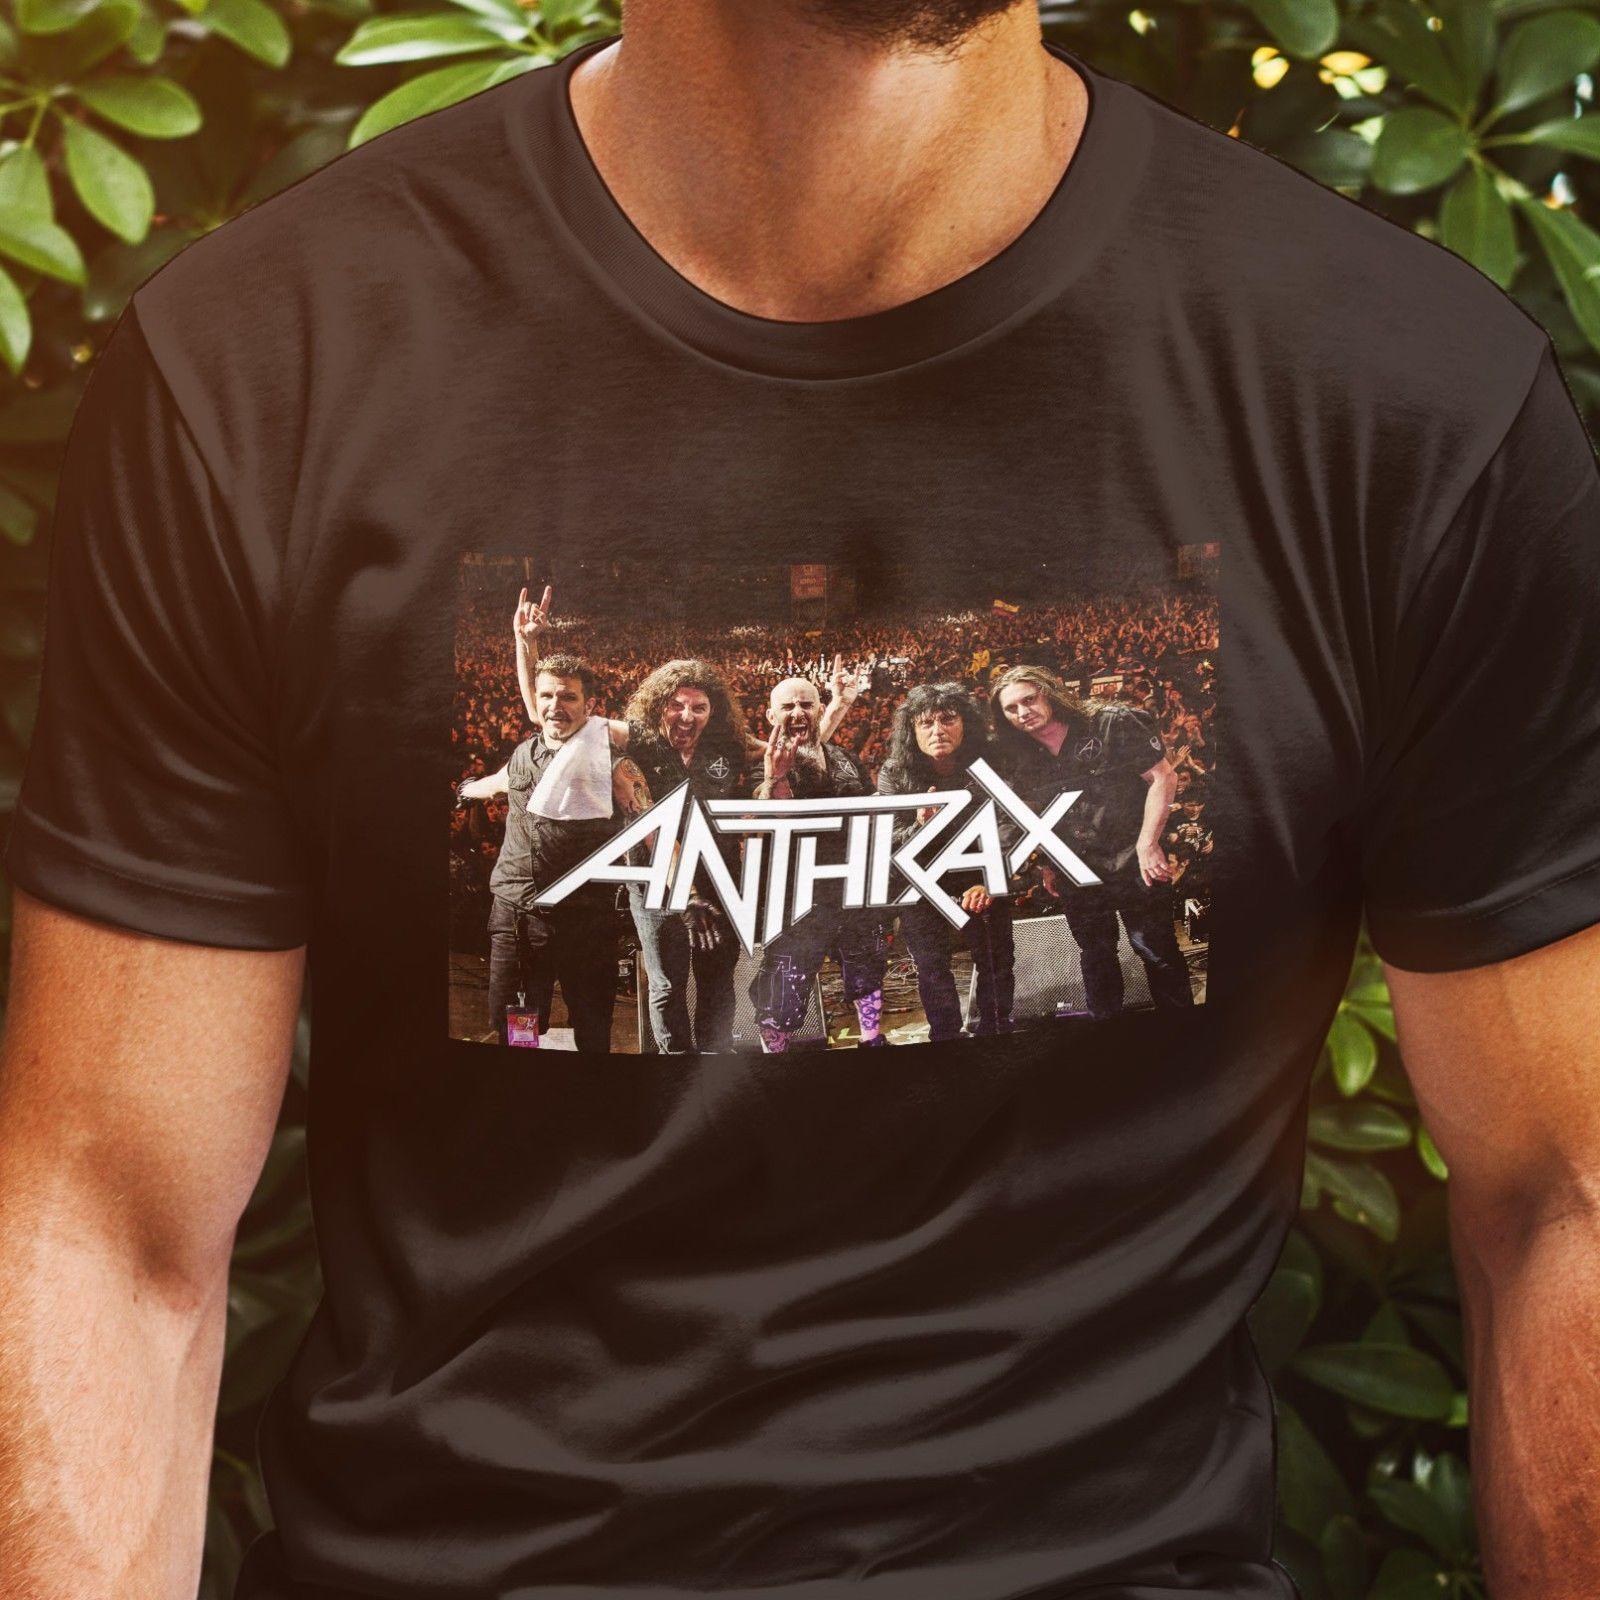 ANTHRAX KILLSWITCH ENGAGE Tour 2018 - T-shirt dos homens negros M-3XL Gel1